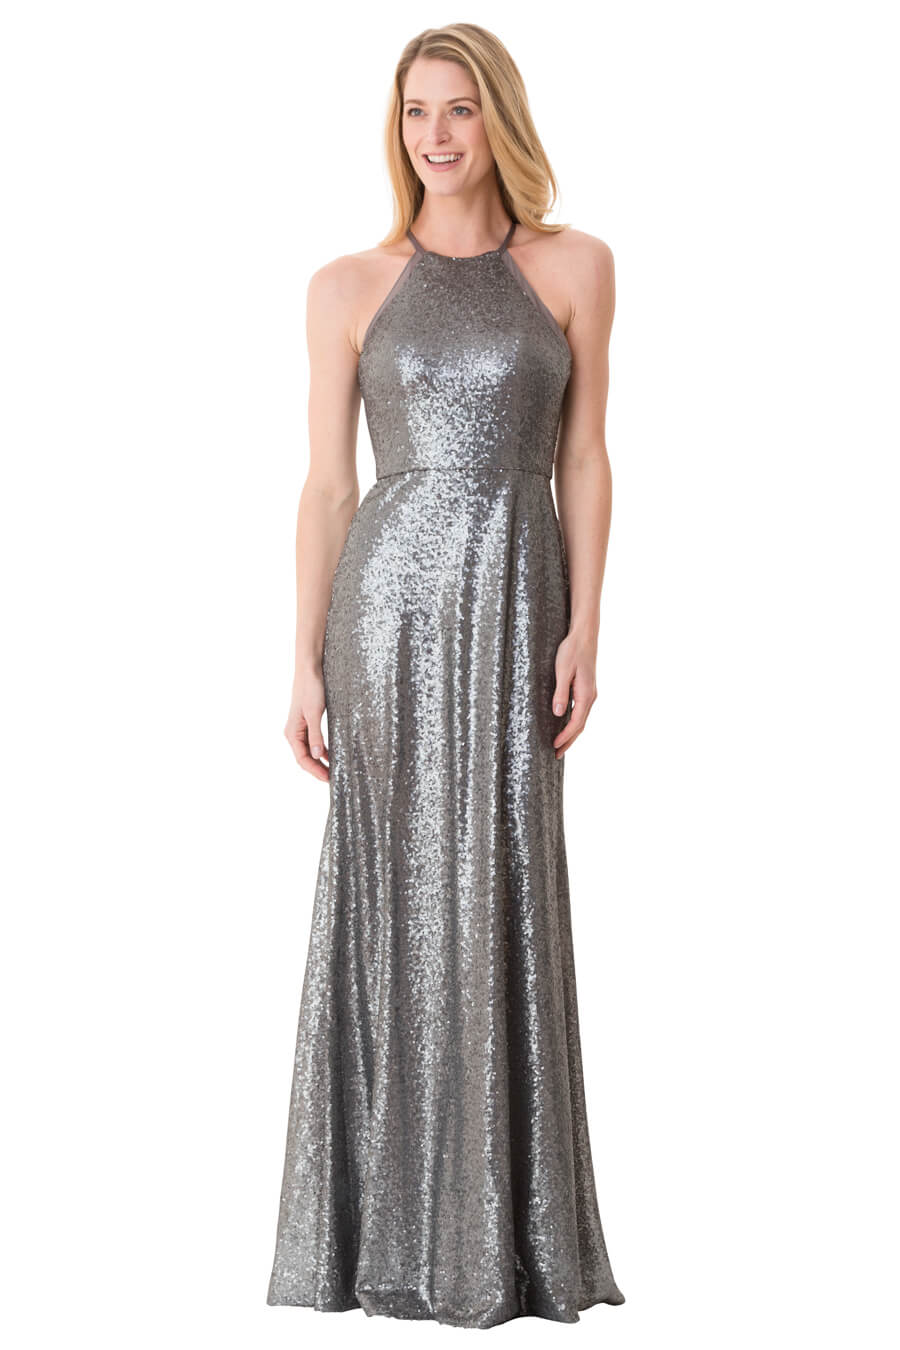 Bari Jay Bridesmaids - Bridesmaid Dresses- Prom Dresses &amp- Formal ...